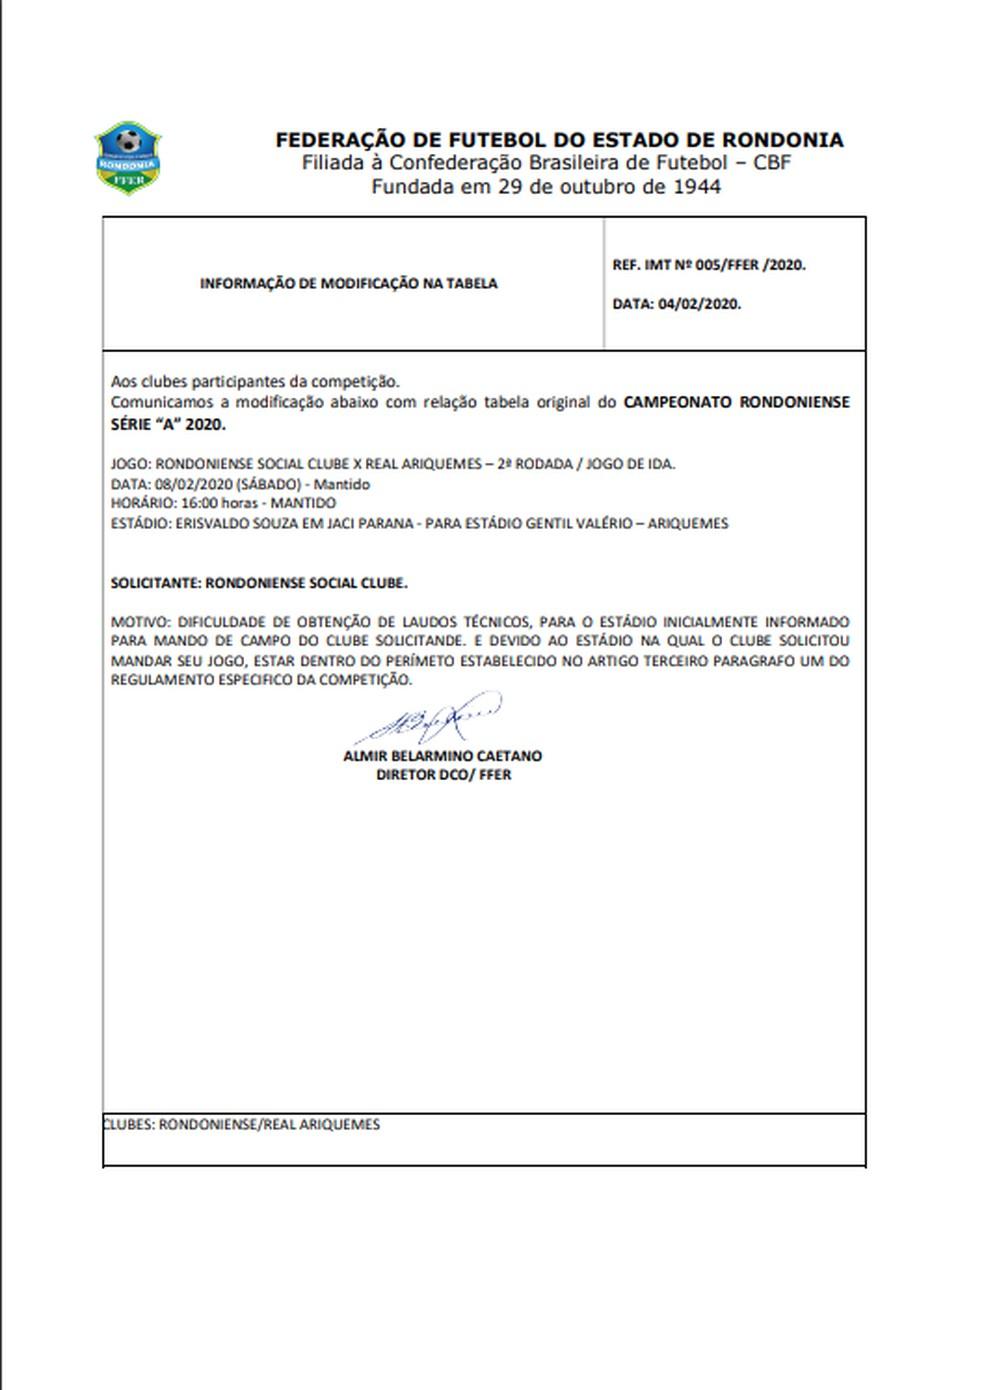 IMT informado a mudança no jogo do Rondoniense e Real Ariquemes no Campeonato Rondoniense 2020 — Foto: FFER